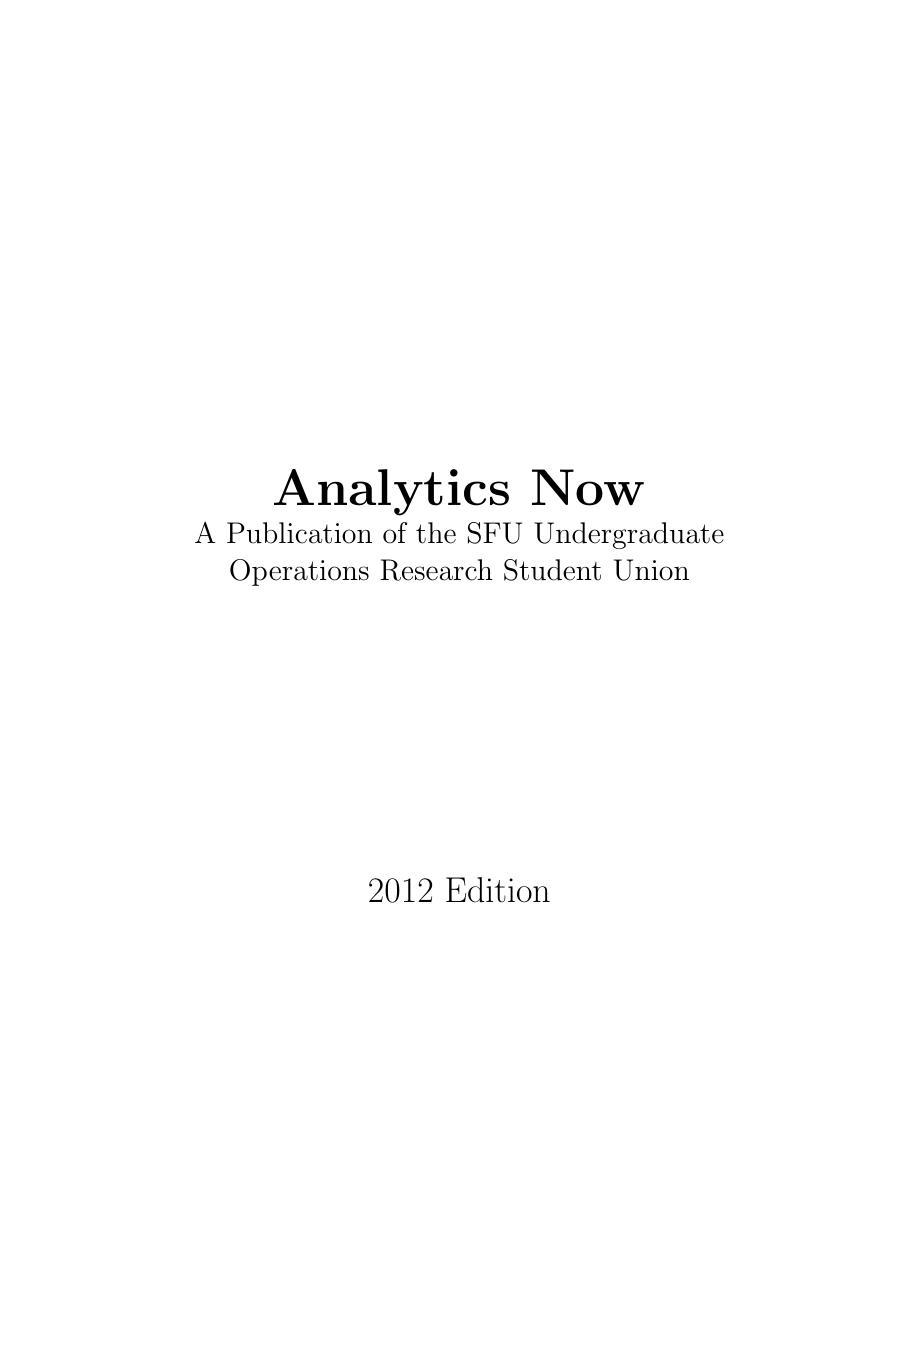 View Analytics Now 2012 Edition